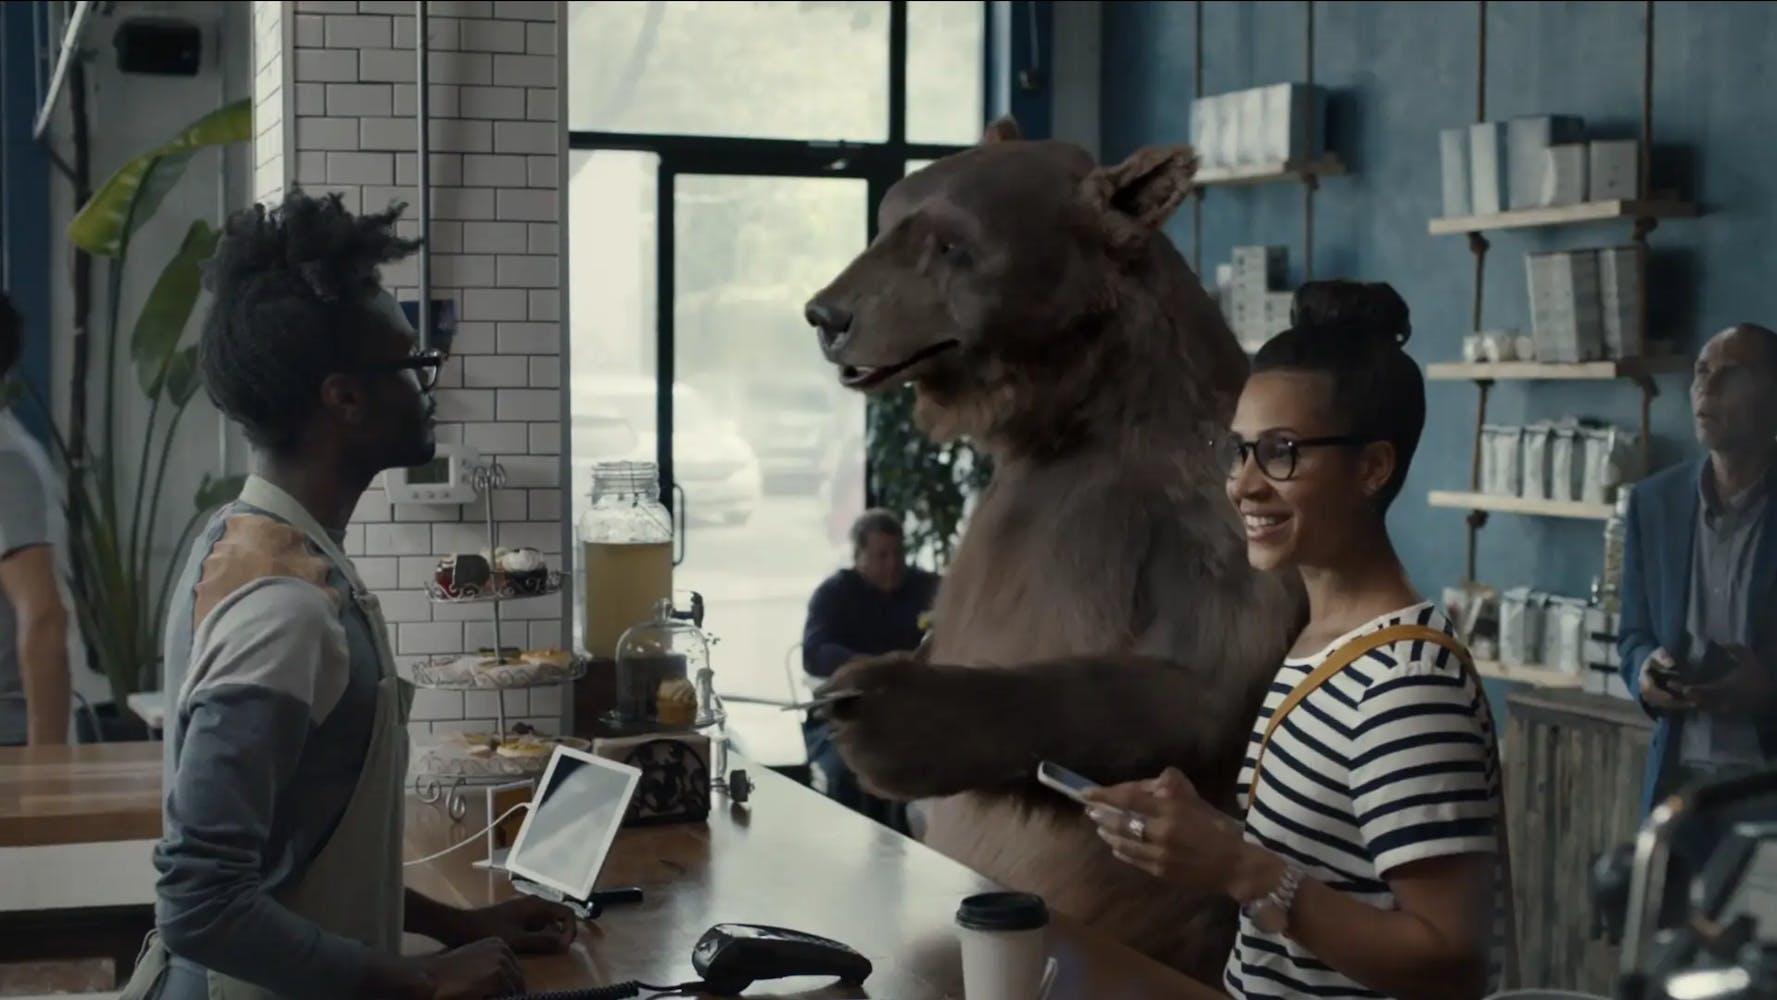 bear---interac---geoff-ashenhurst